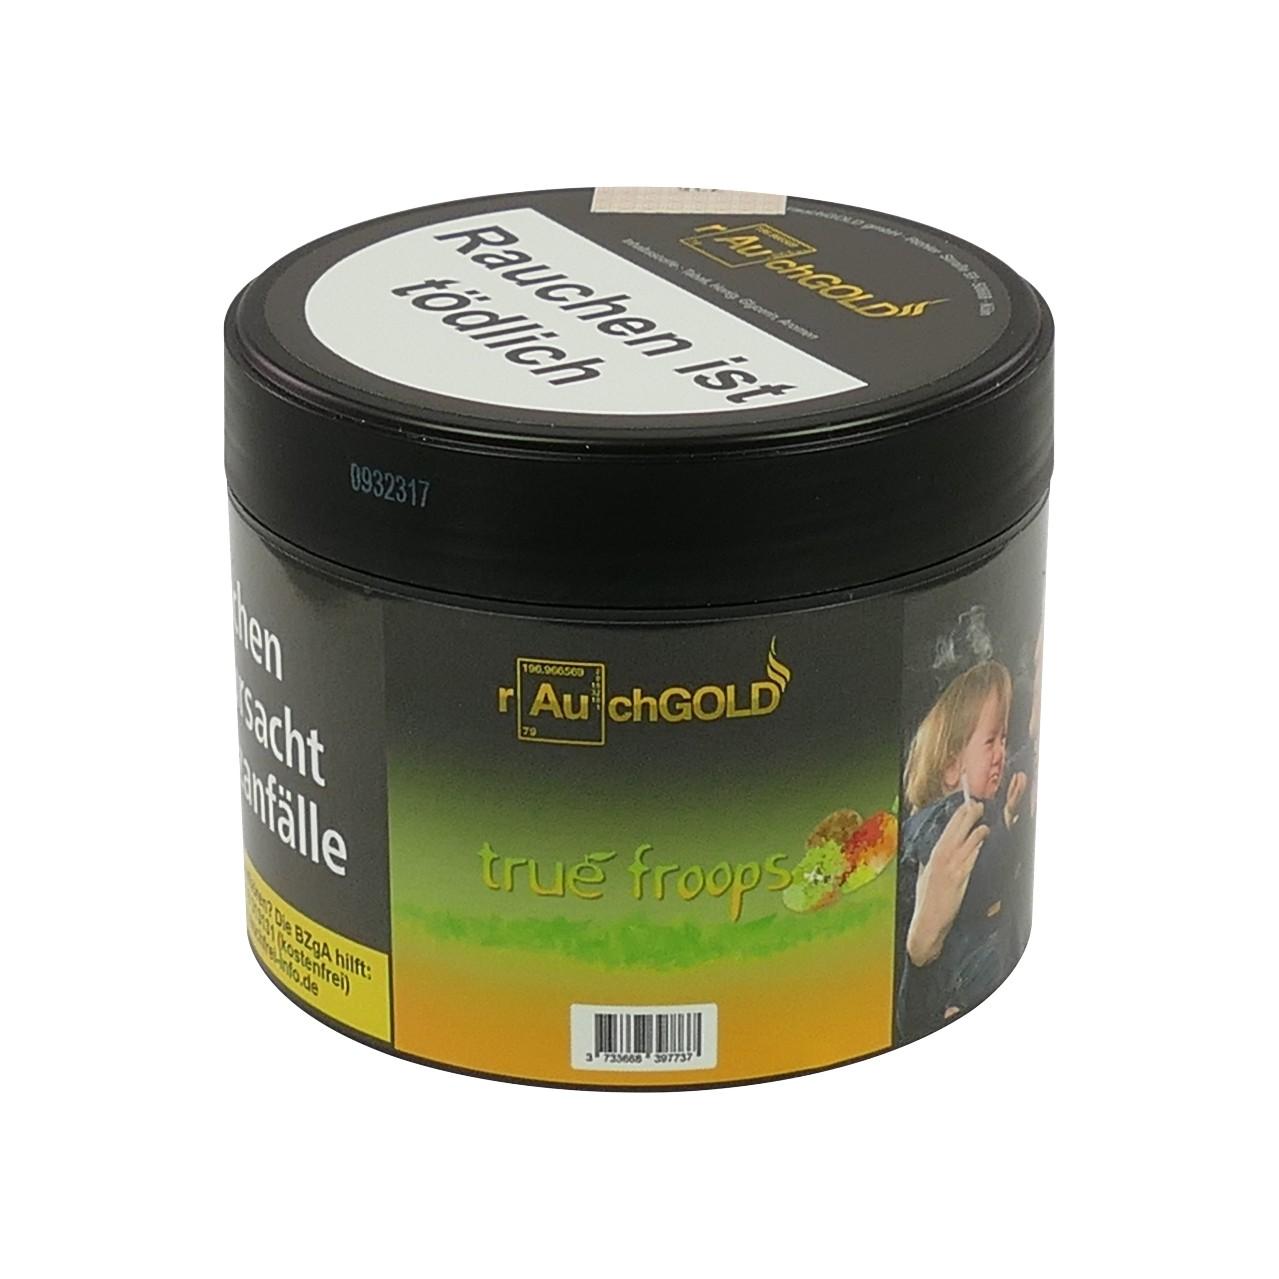 Rauchgold Mango Kiwi (True Froops) Shisha Tabak, 200g